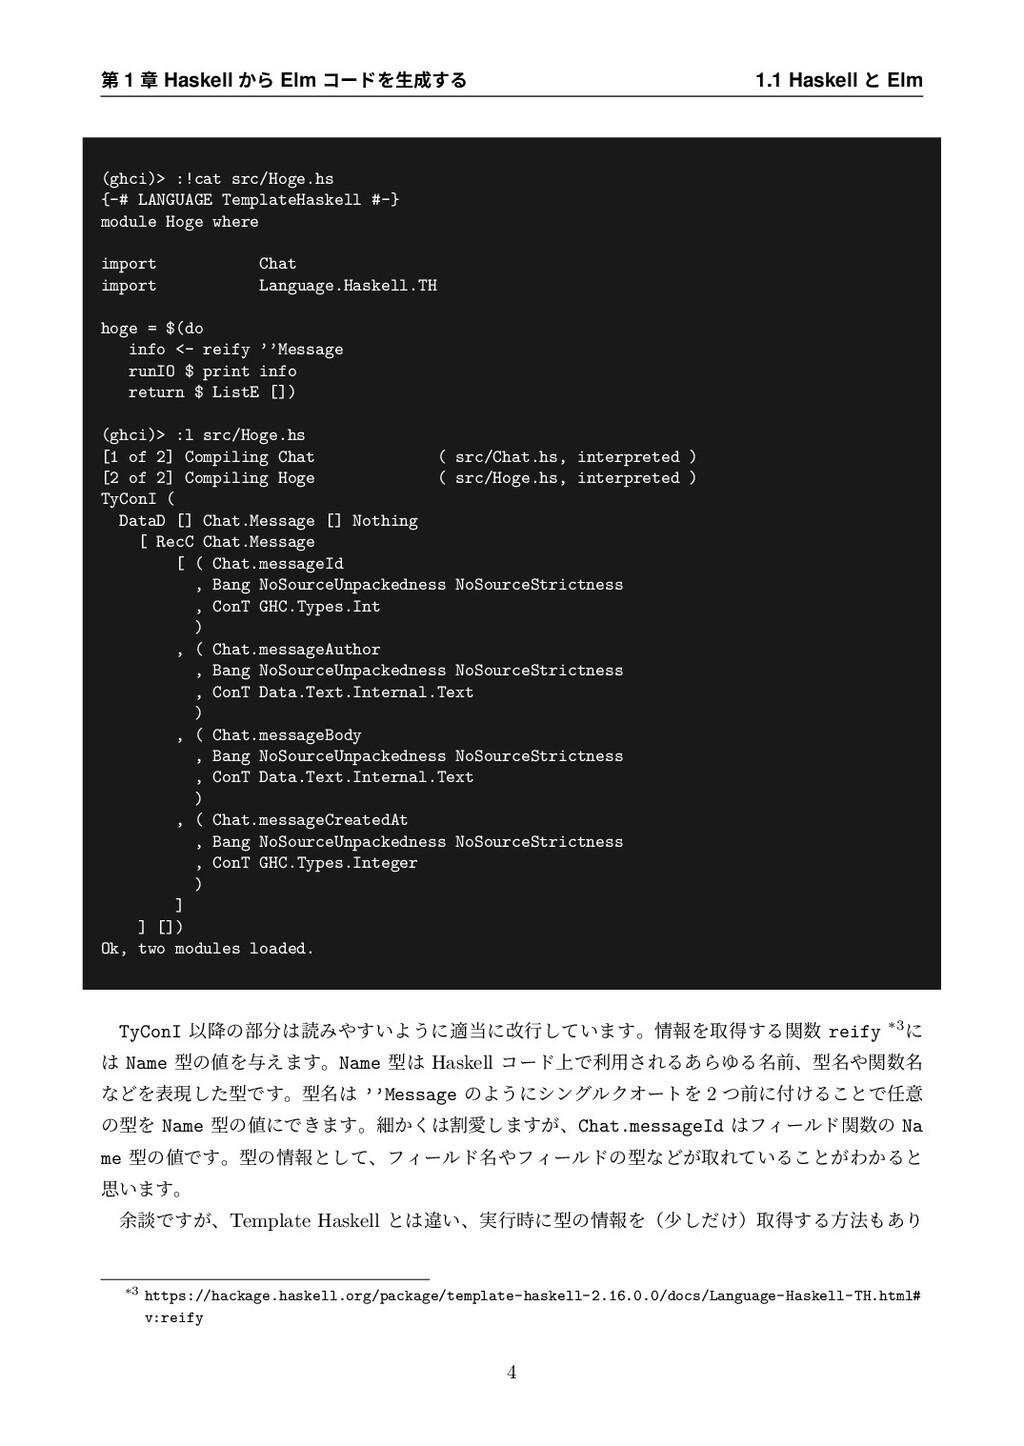 ୈ 1 ষ Haskell ͔Β Elm ίʔυΛੜ͢Δ 1.1 Haskell ͱ Elm...